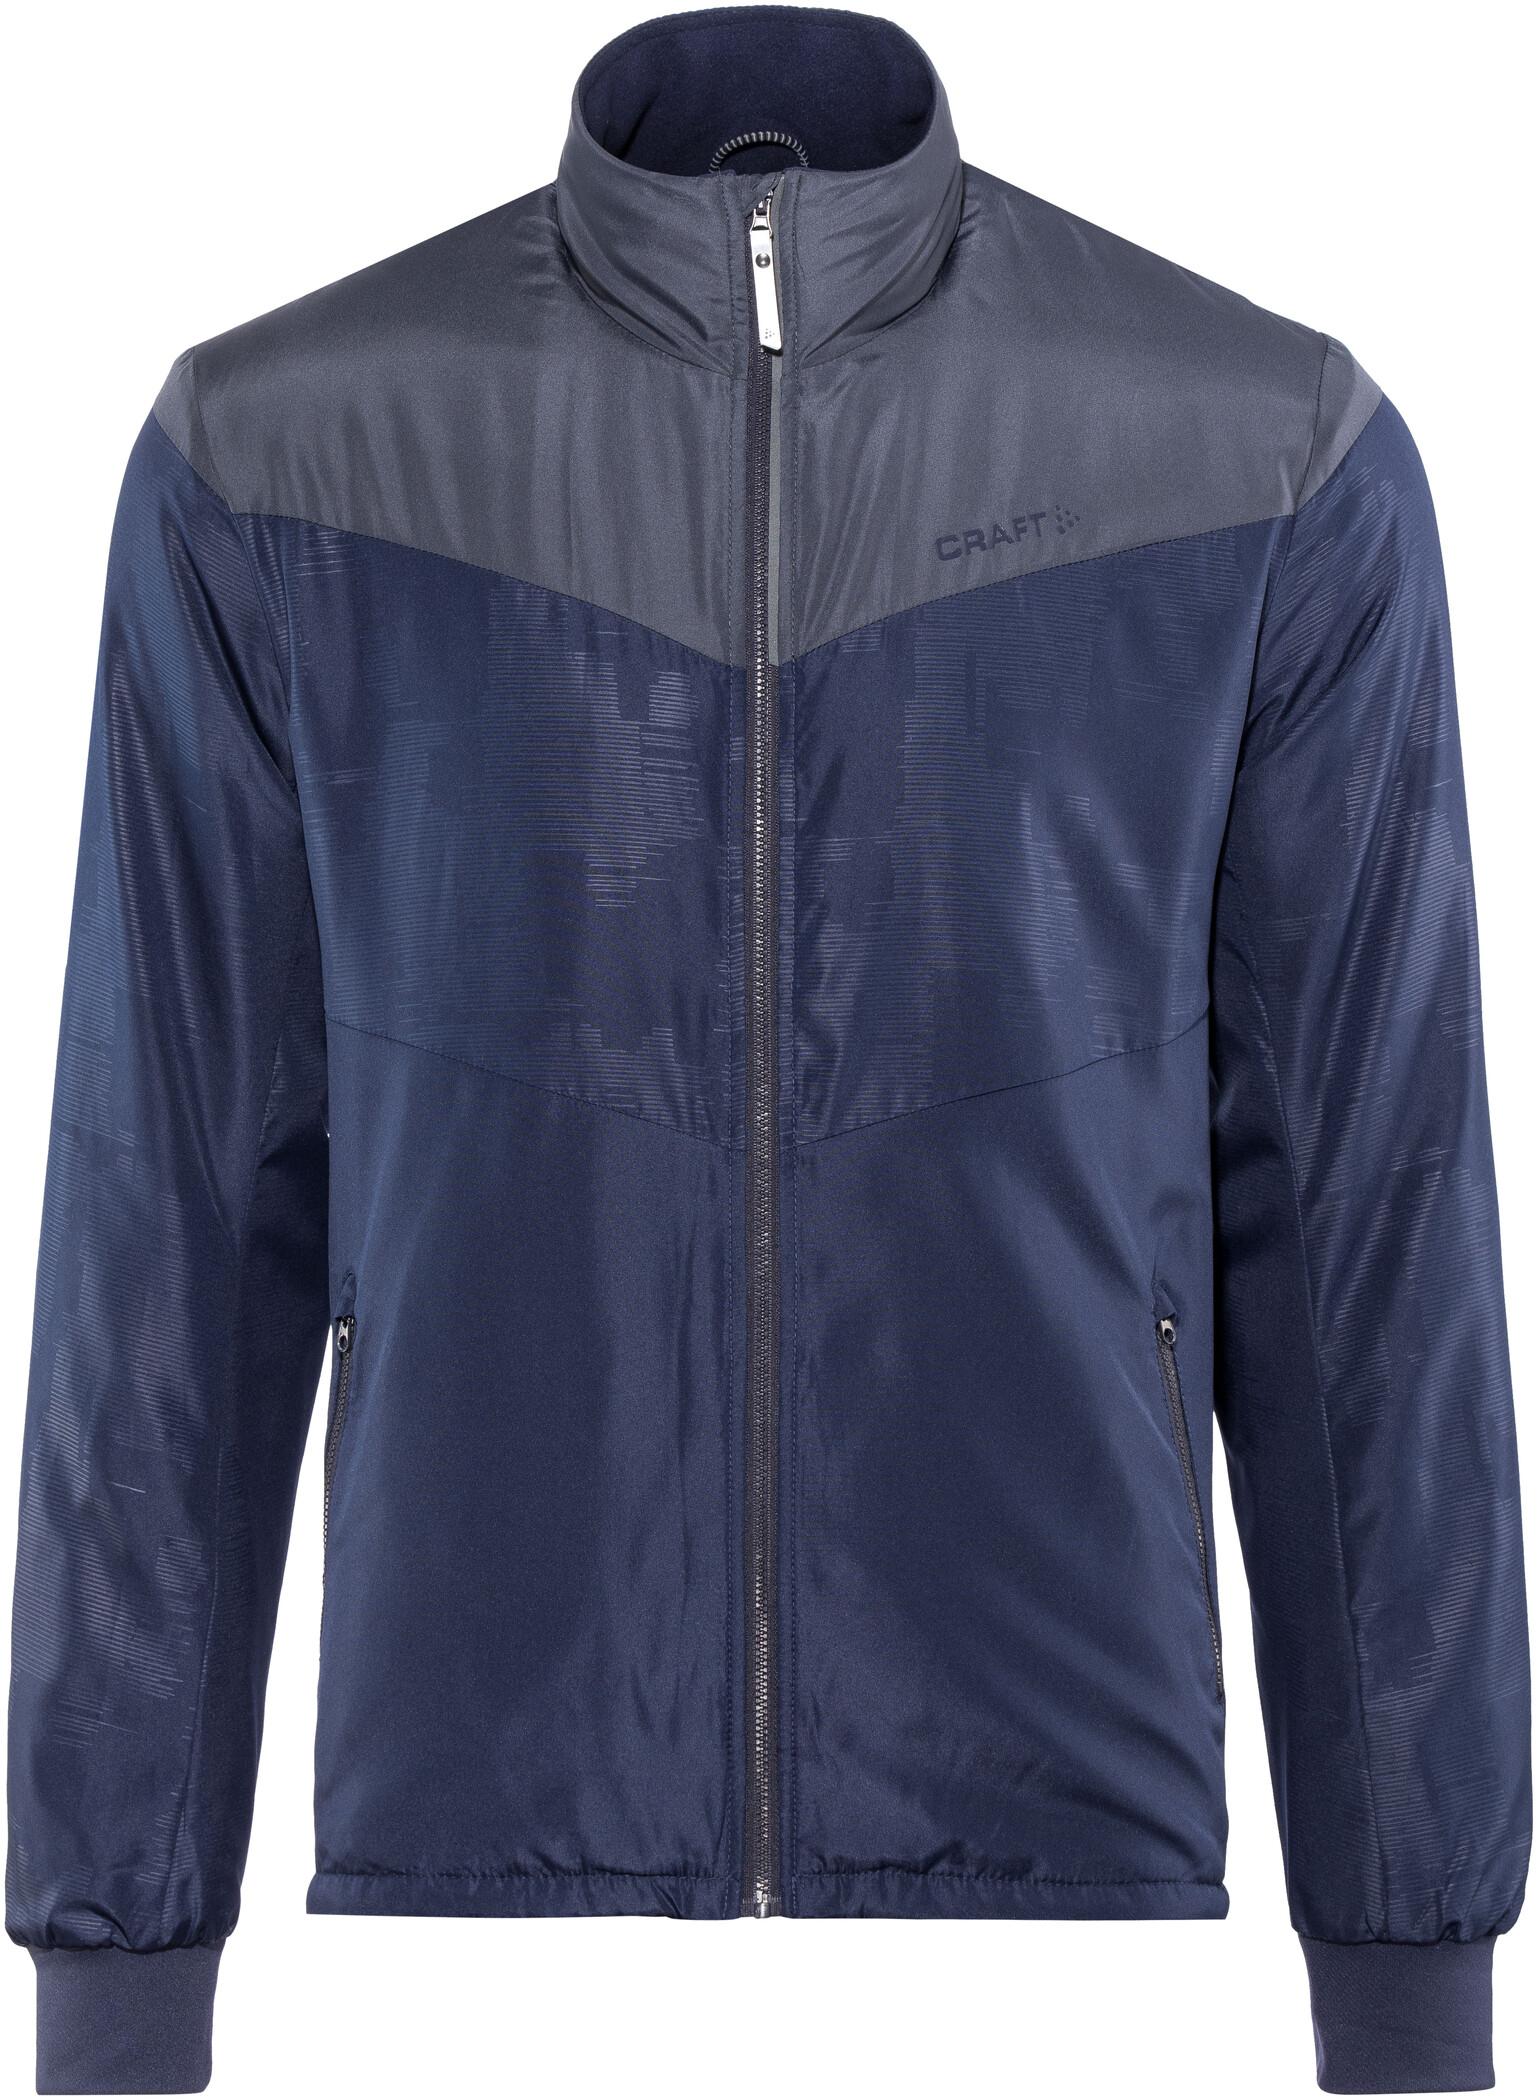 Craft Eaze Winter Jacket Herr maritimegravel